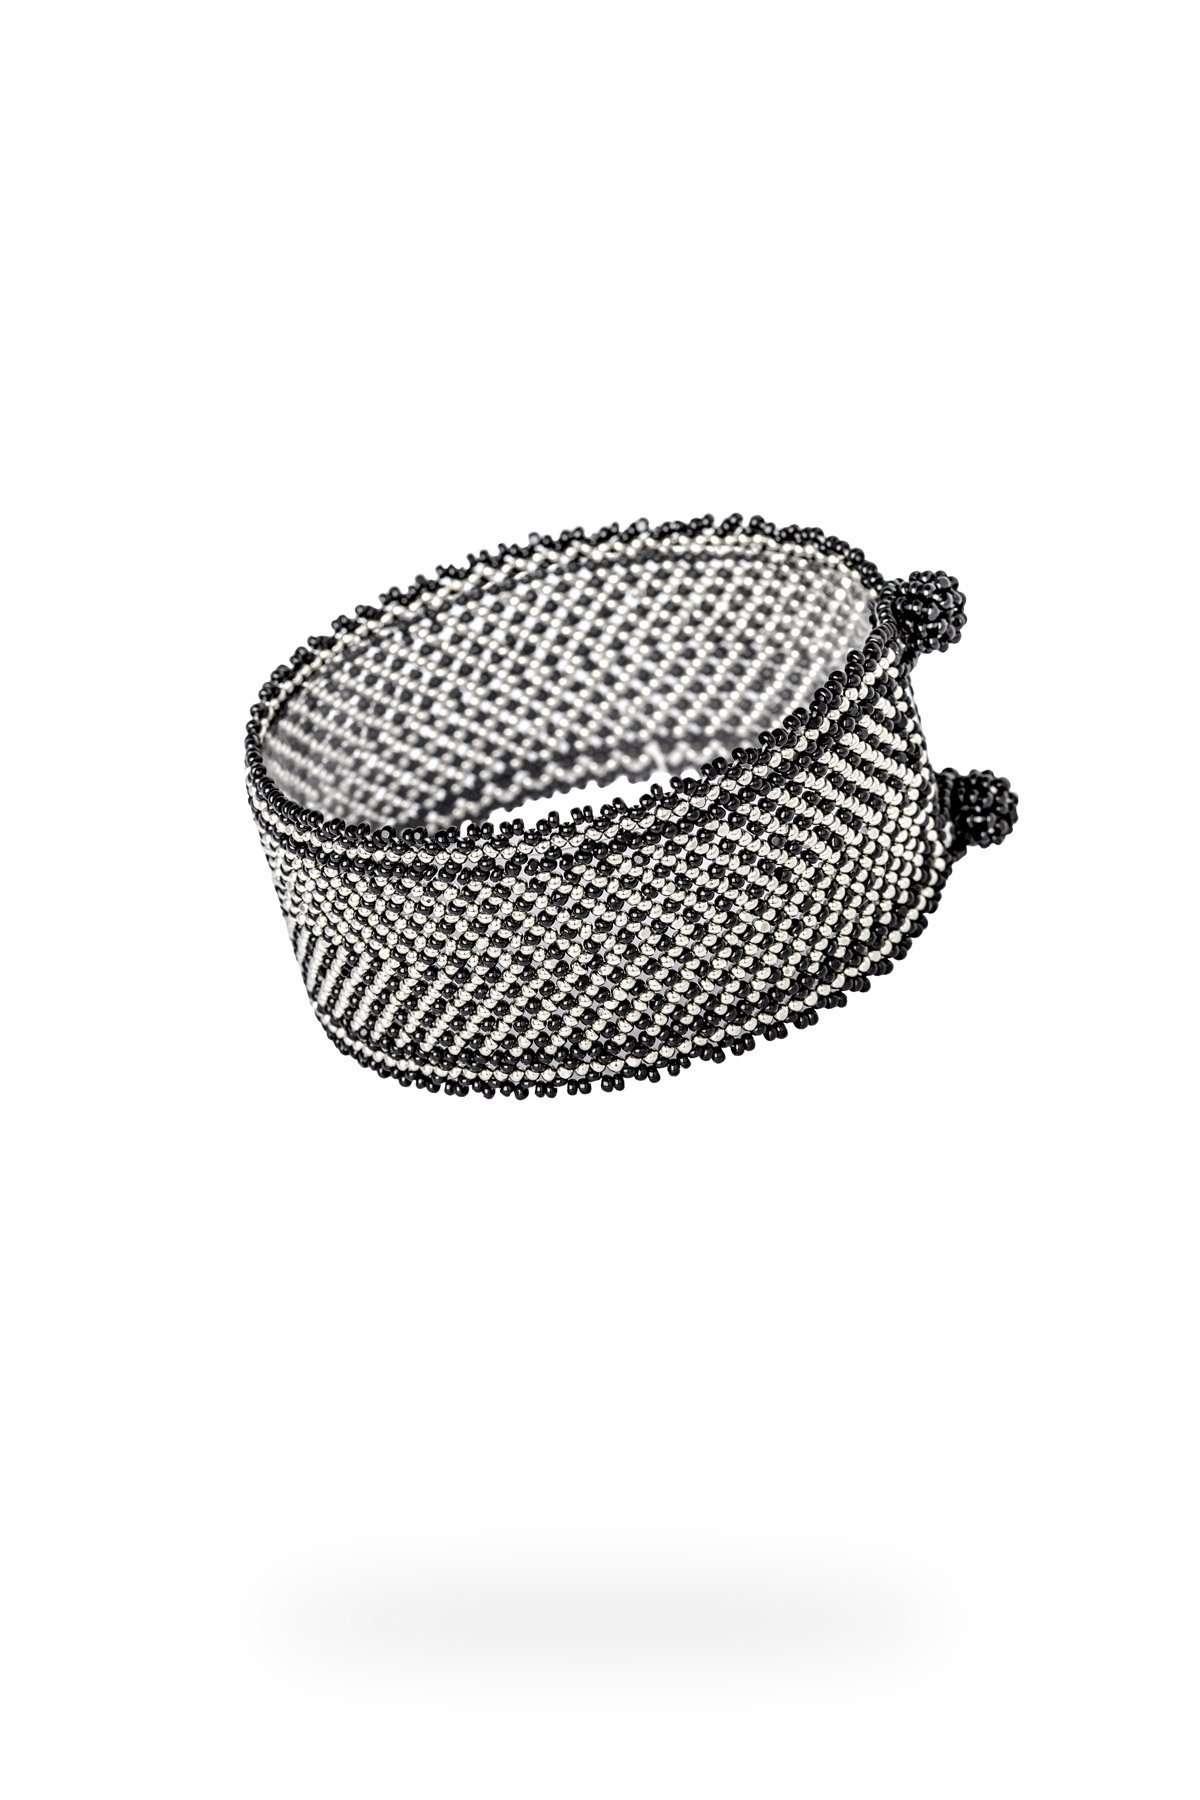 012 brazaletes mediano plata negro